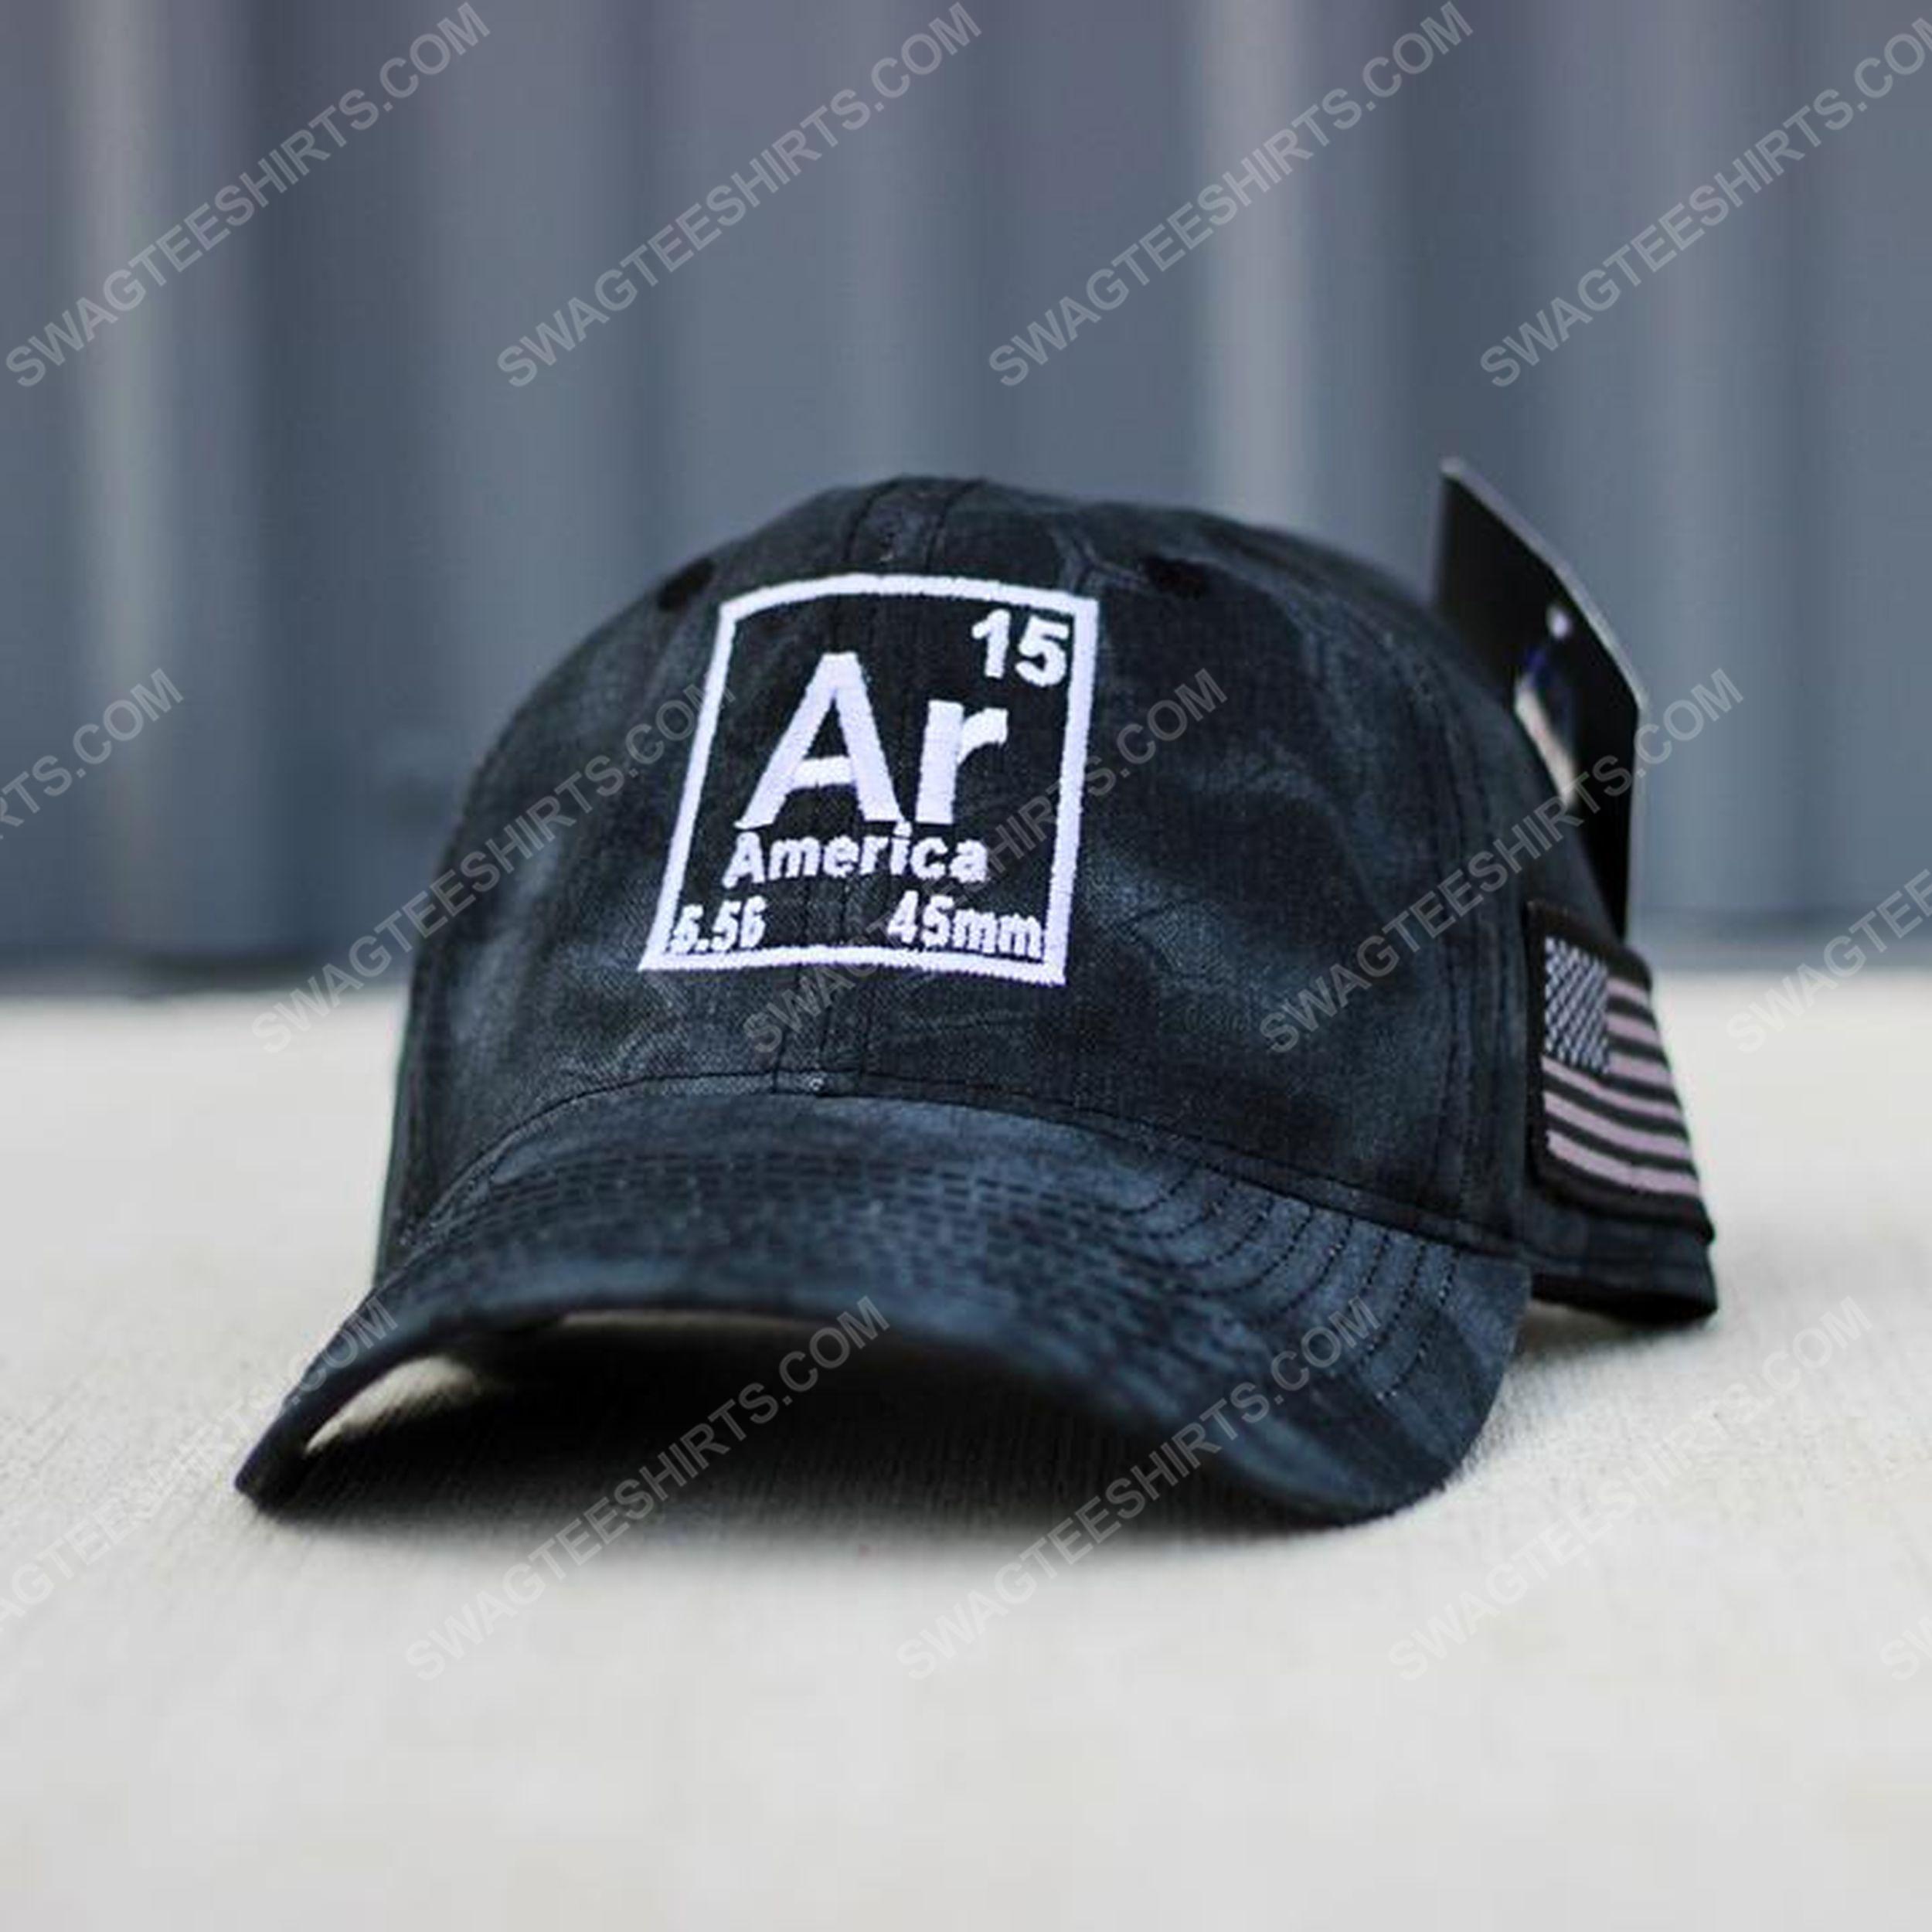 Ar 15 american full print classic hat 1 - Copy (3)